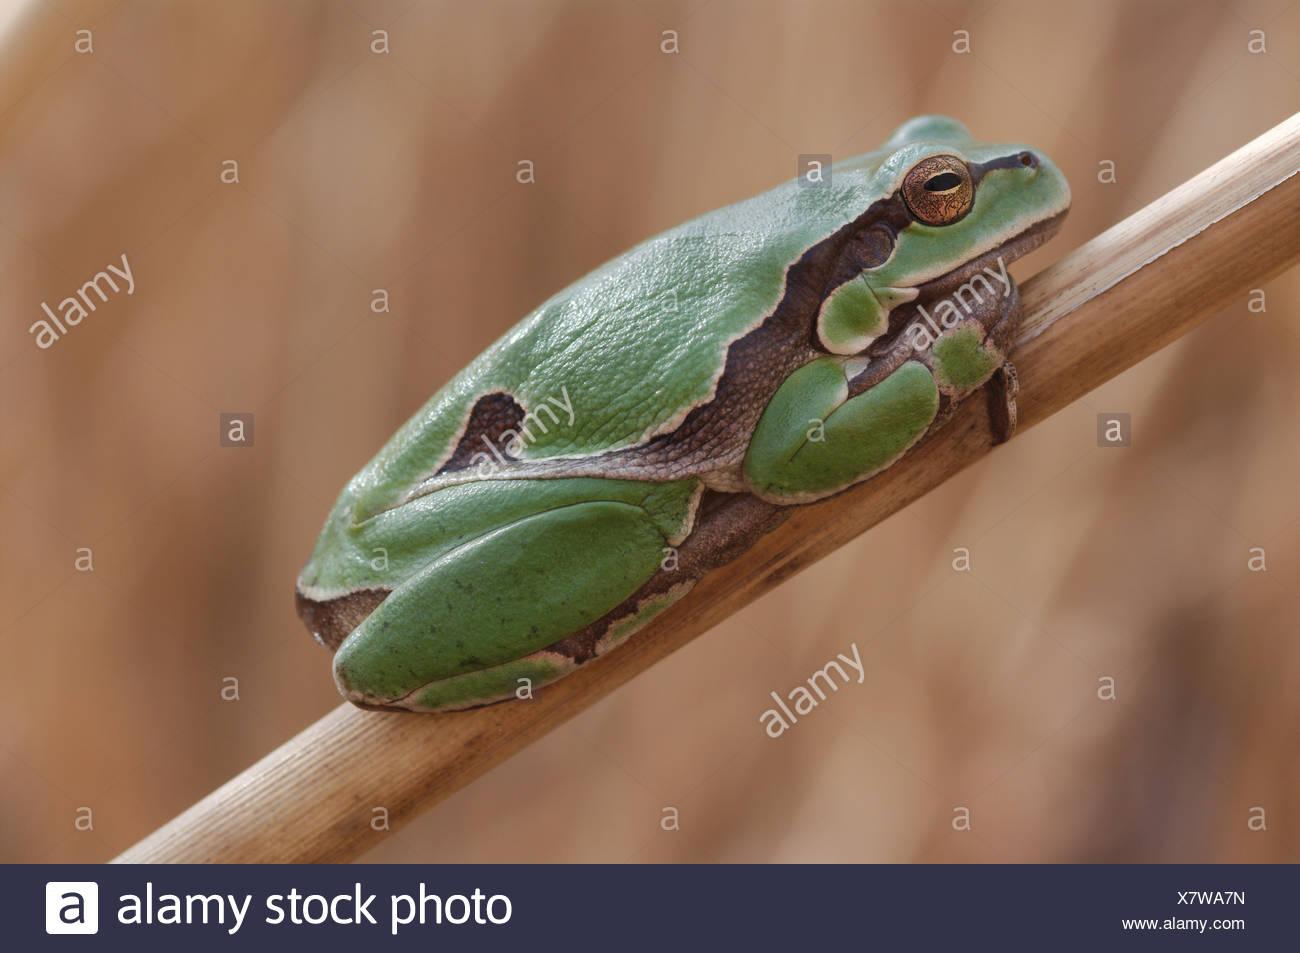 Austria, Europe, Burgenland, amphibian, Hylianea, European tree frog, tree frog, frog, Hyla arborea, reed Stock Photo